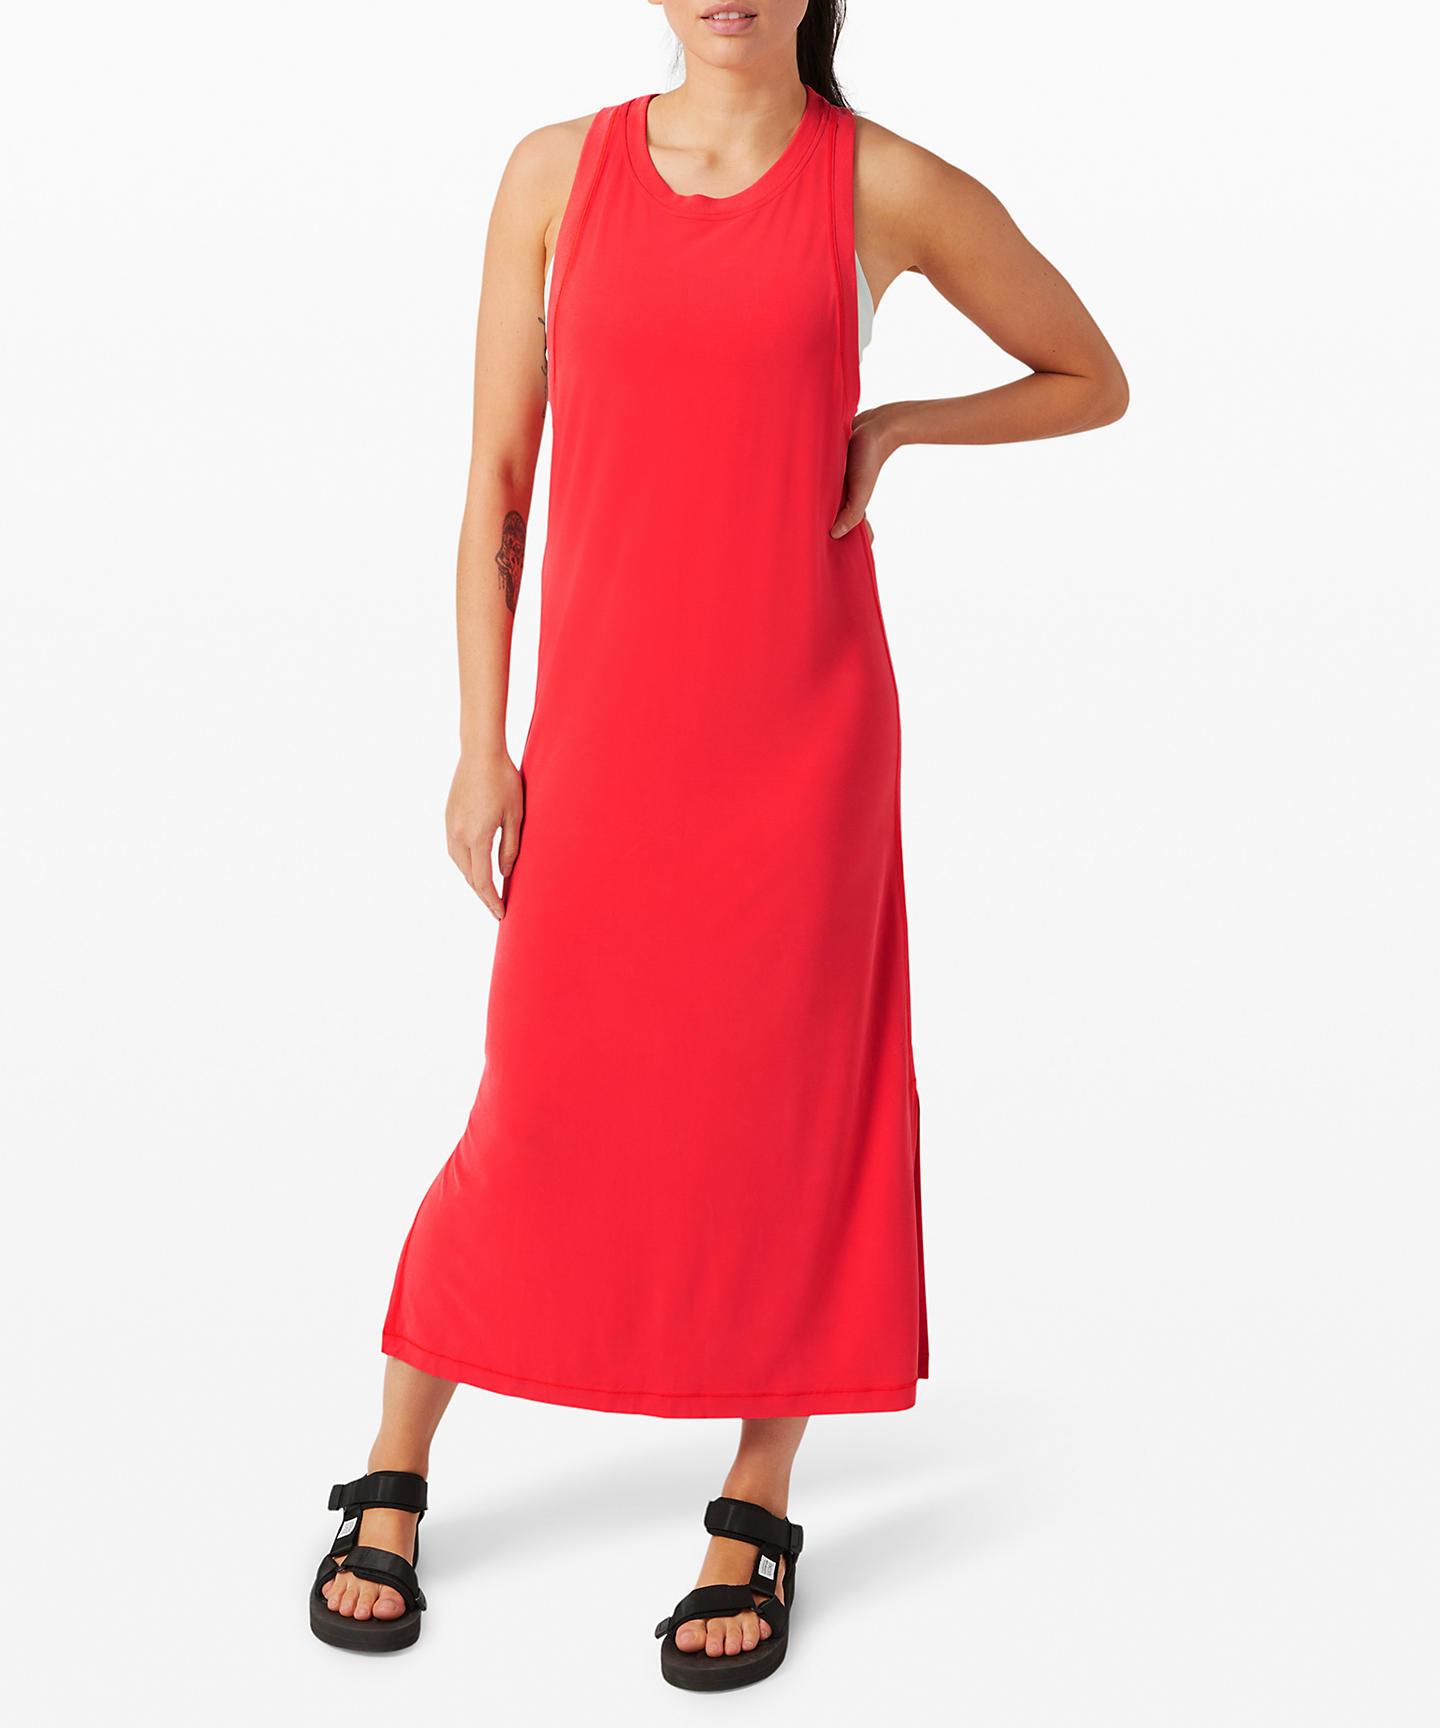 Lululemon_ease of it all dress_lululemon upload_carnation red